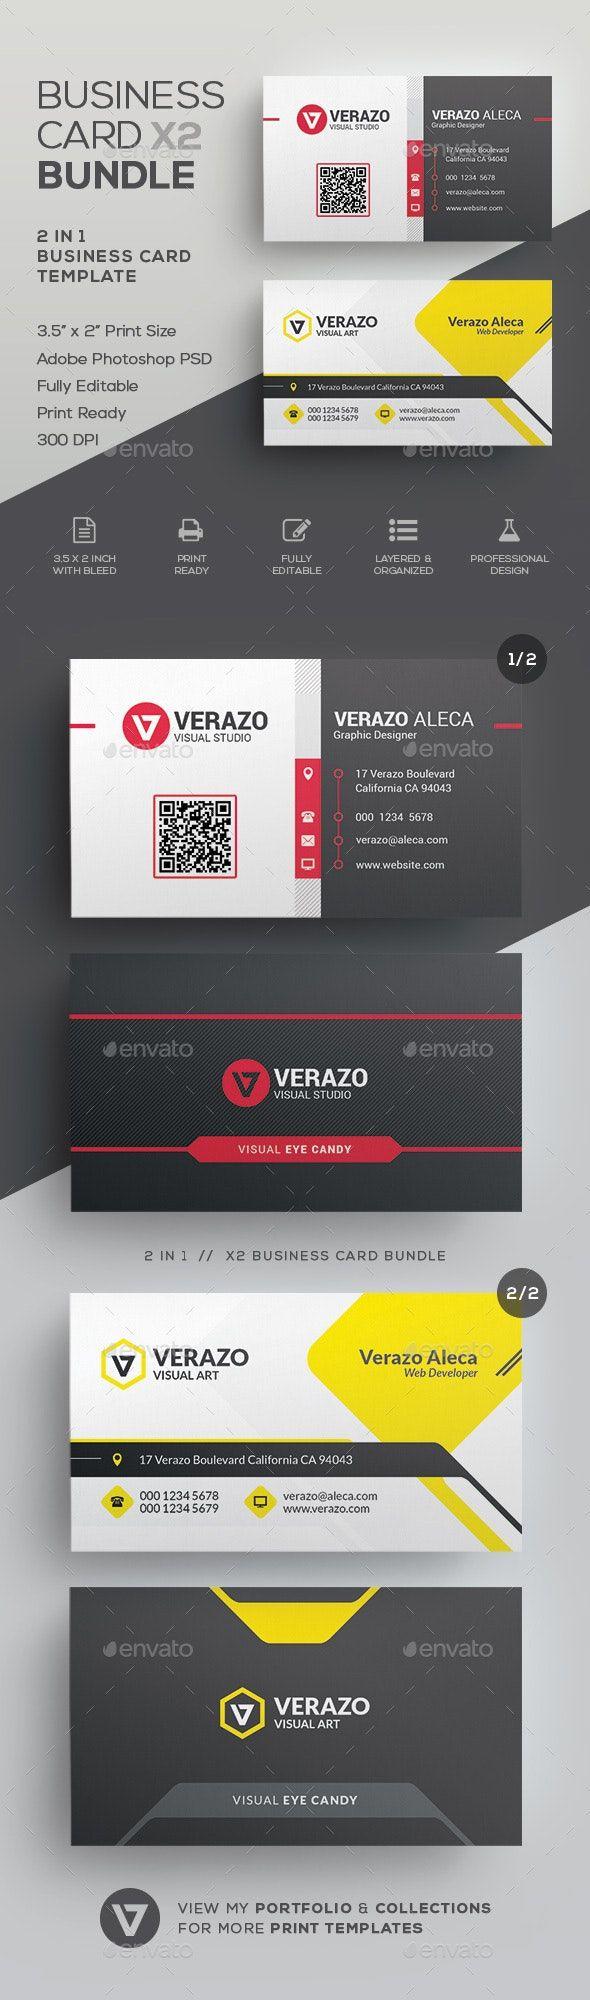 Business Card Bundle 58 Business Card Template Psd Buy Business Cards Corporate Business Card